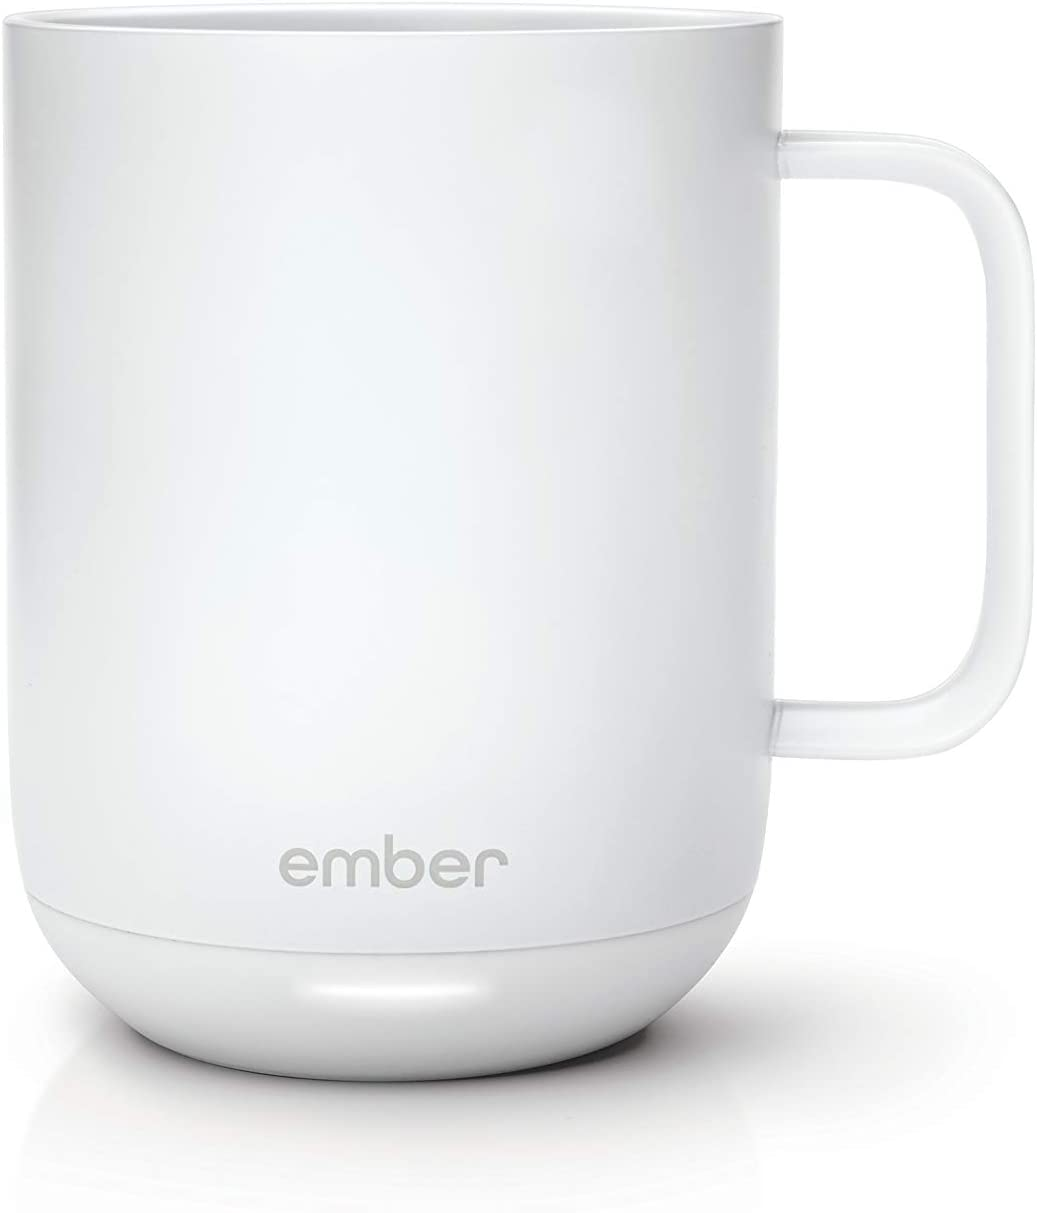 White Ember electric coffee mug